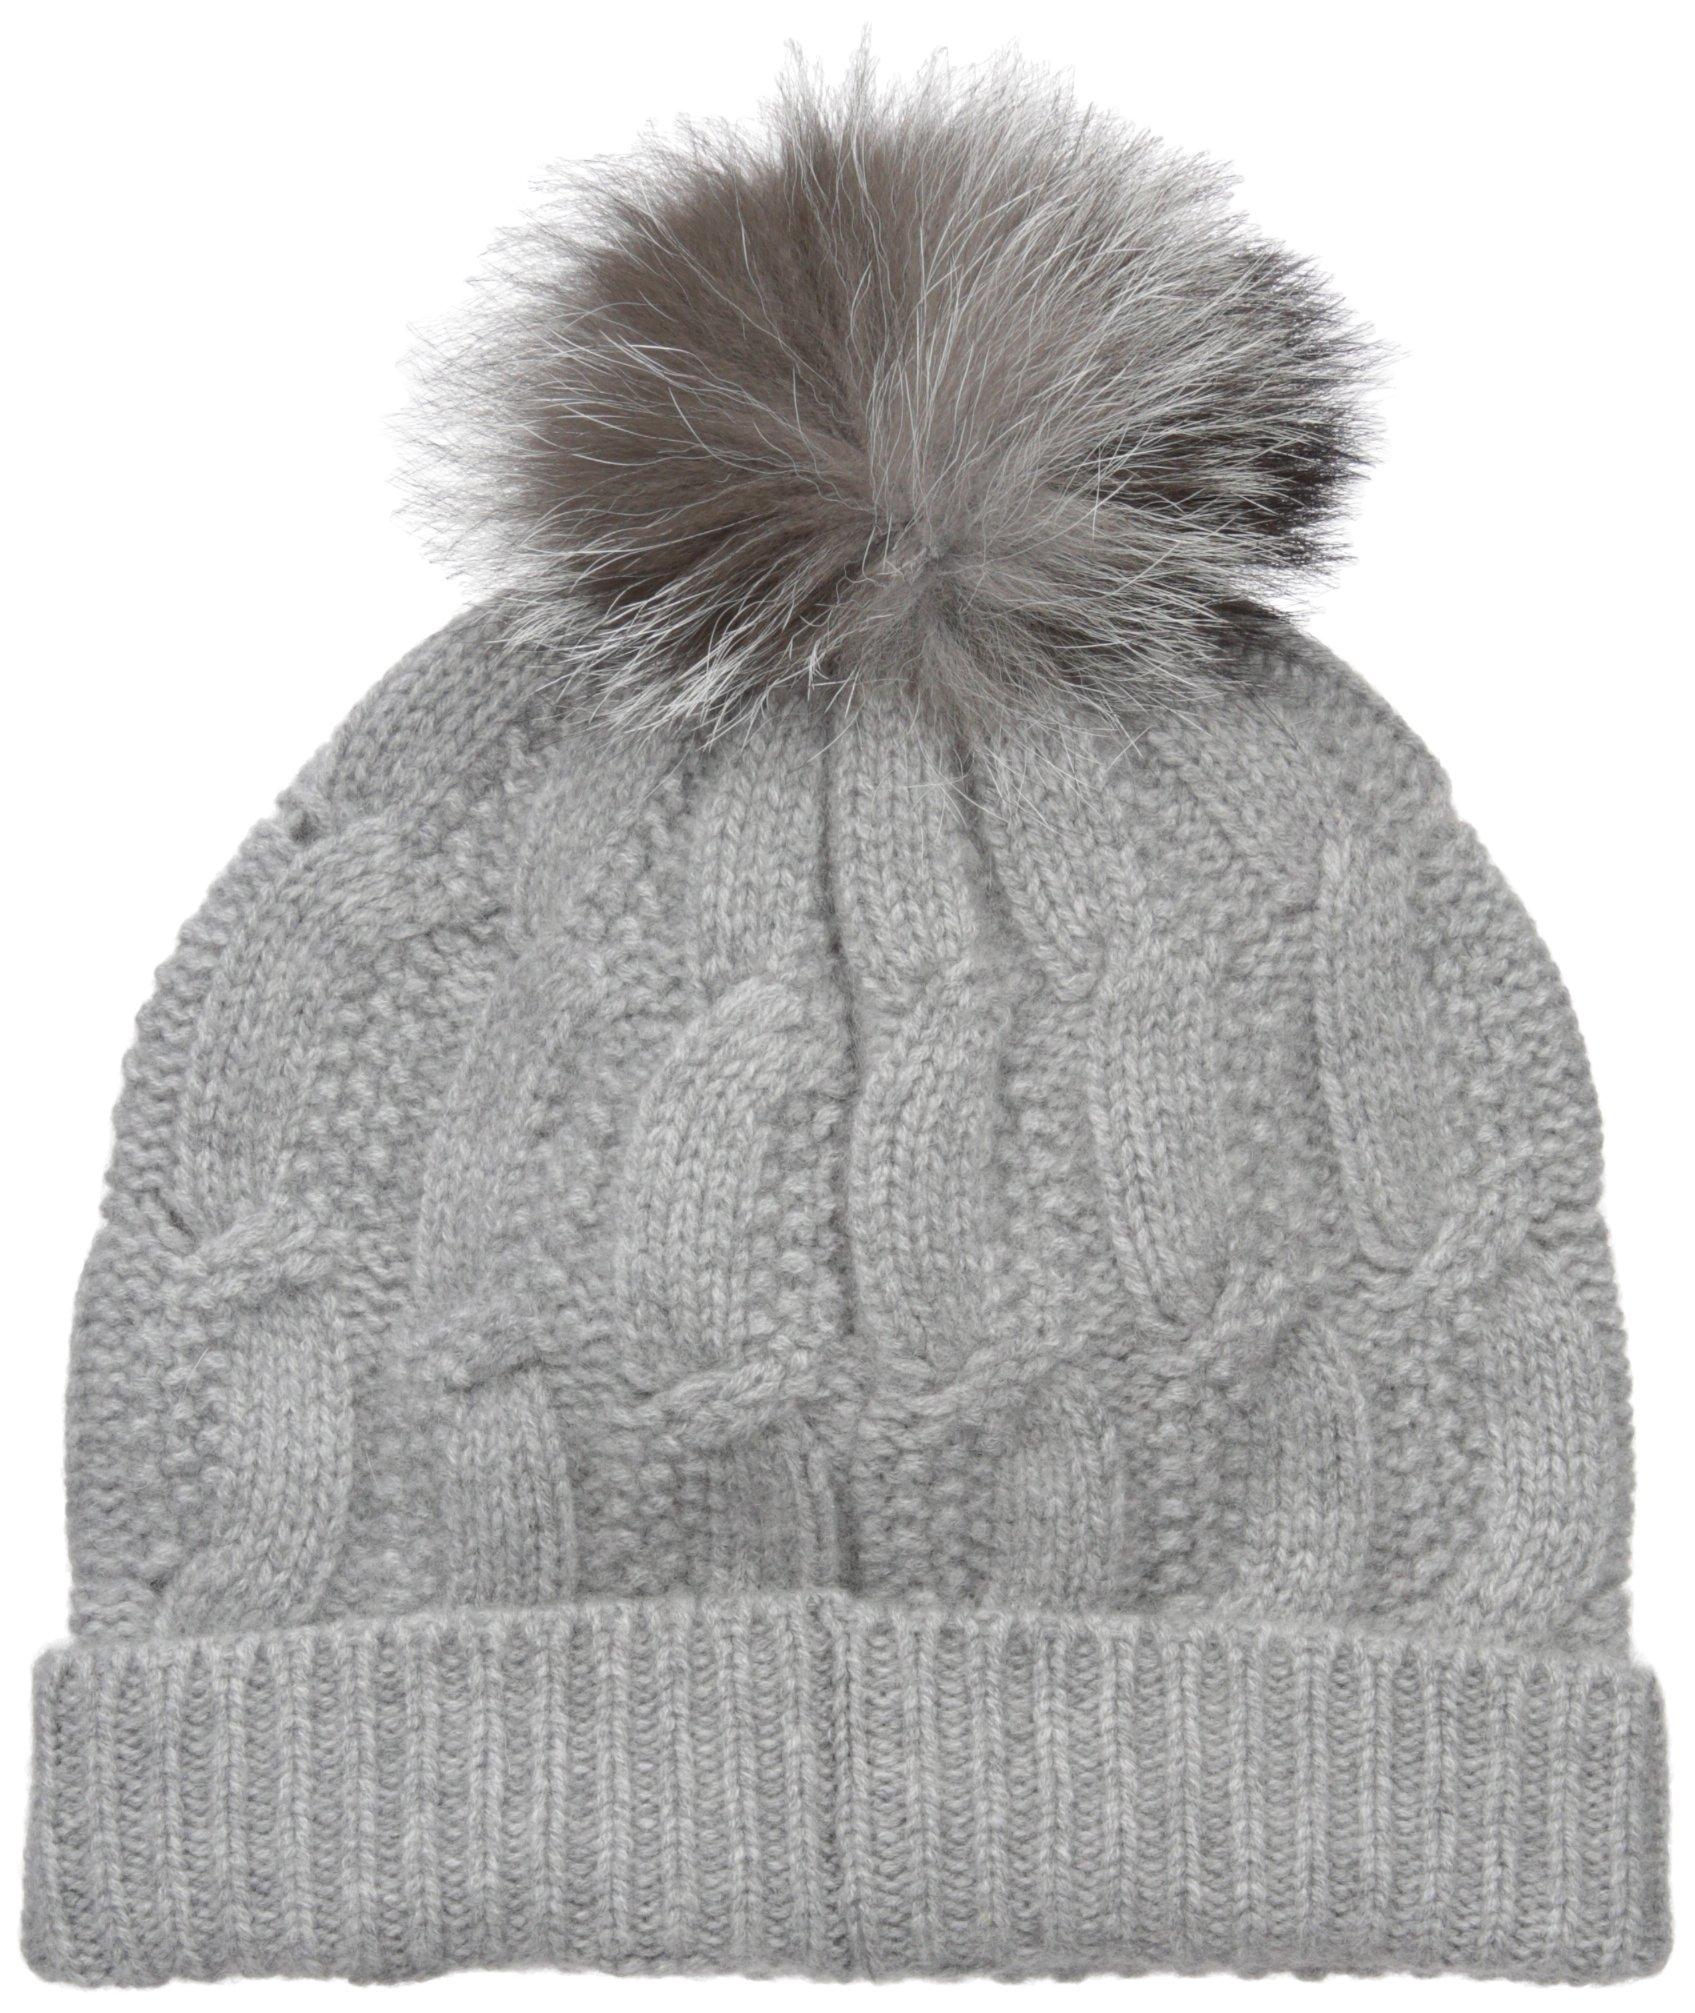 Sofia Cashmere Women's 100% Cashmere Cable Seed Stitch Hat With Fox Fur Pom, Elephant Grey, One by Sofia Cashmere